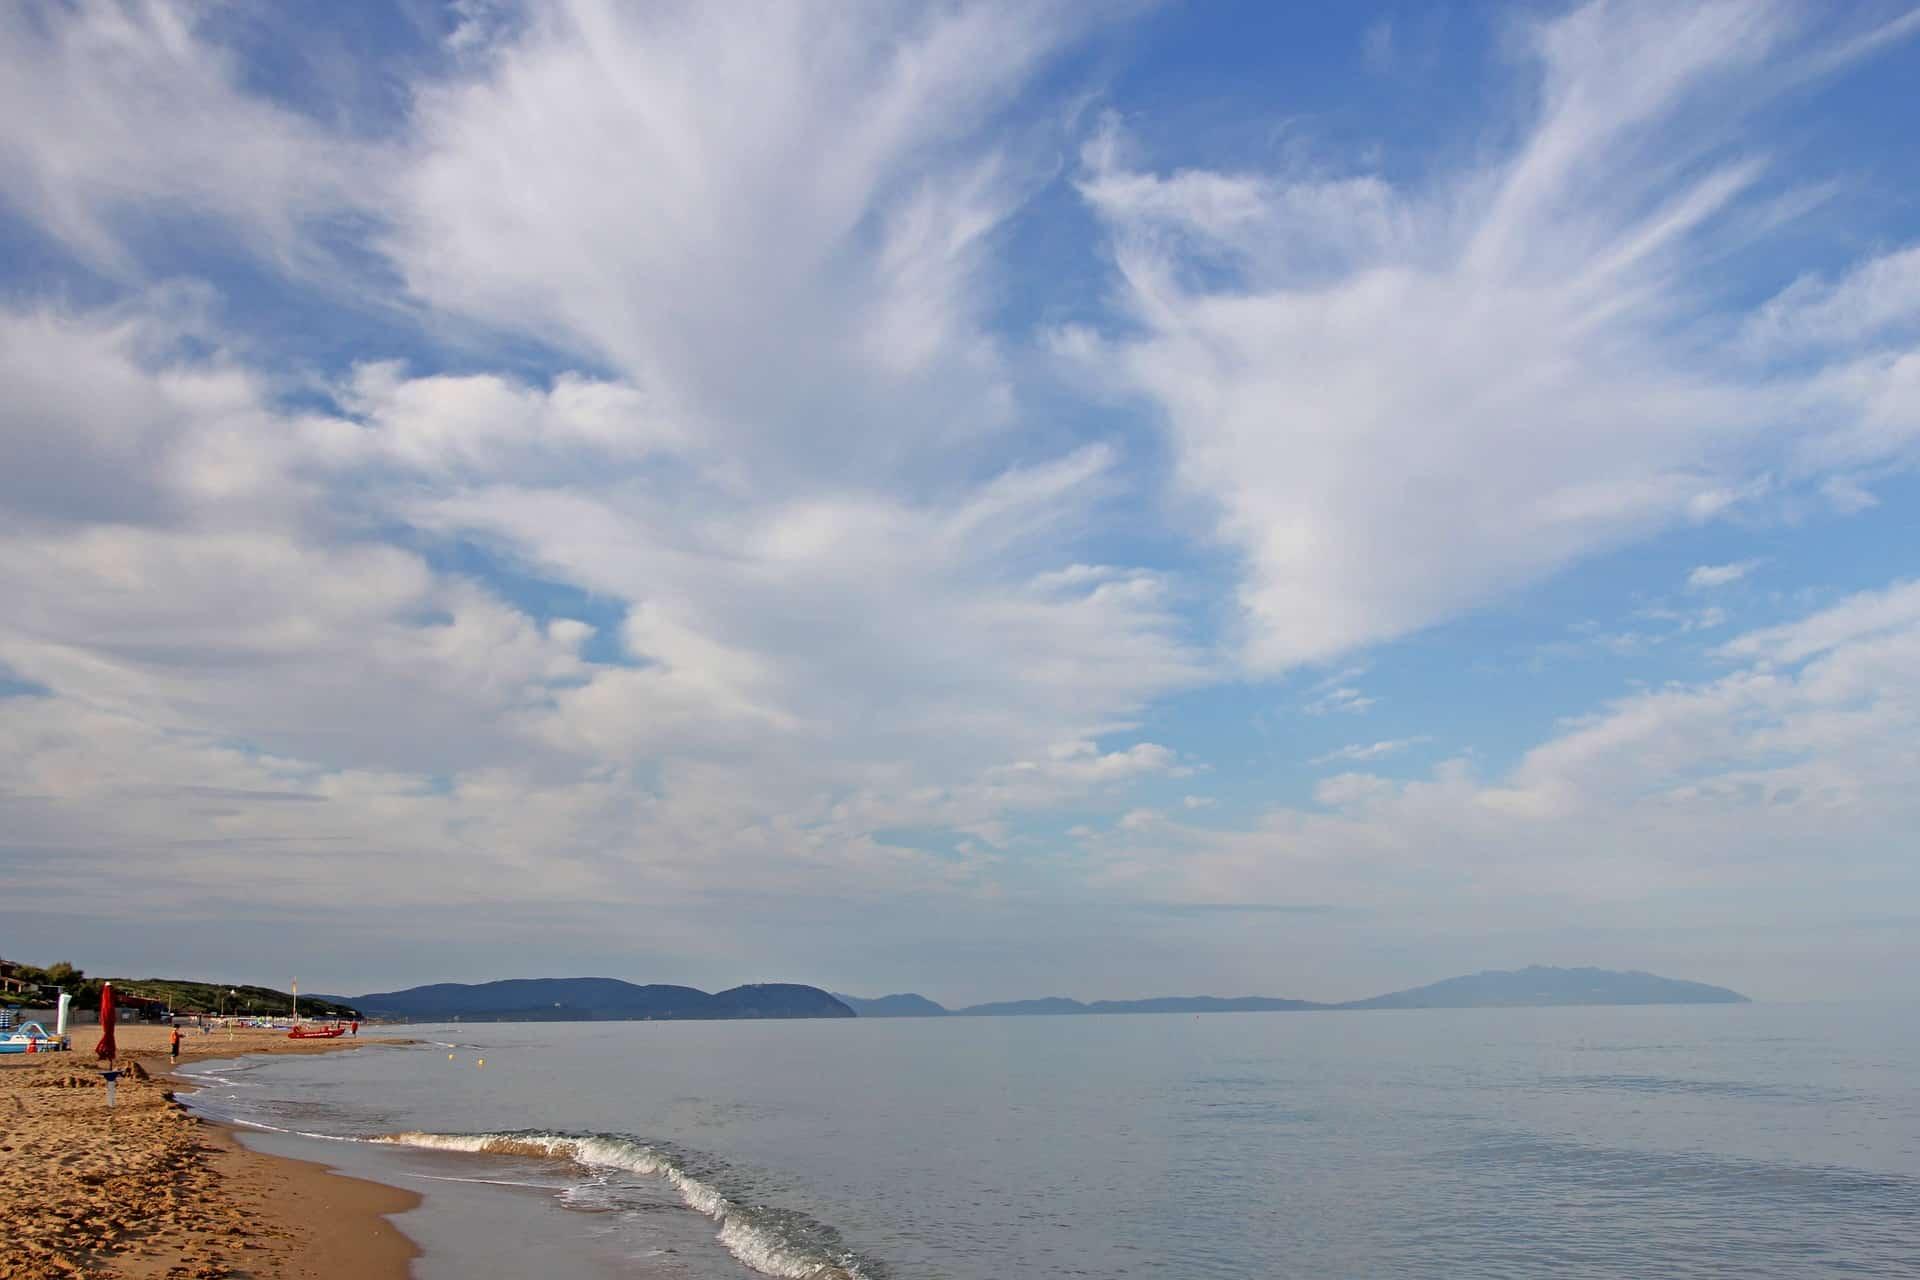 Follonica - Camping am Meer in Italien